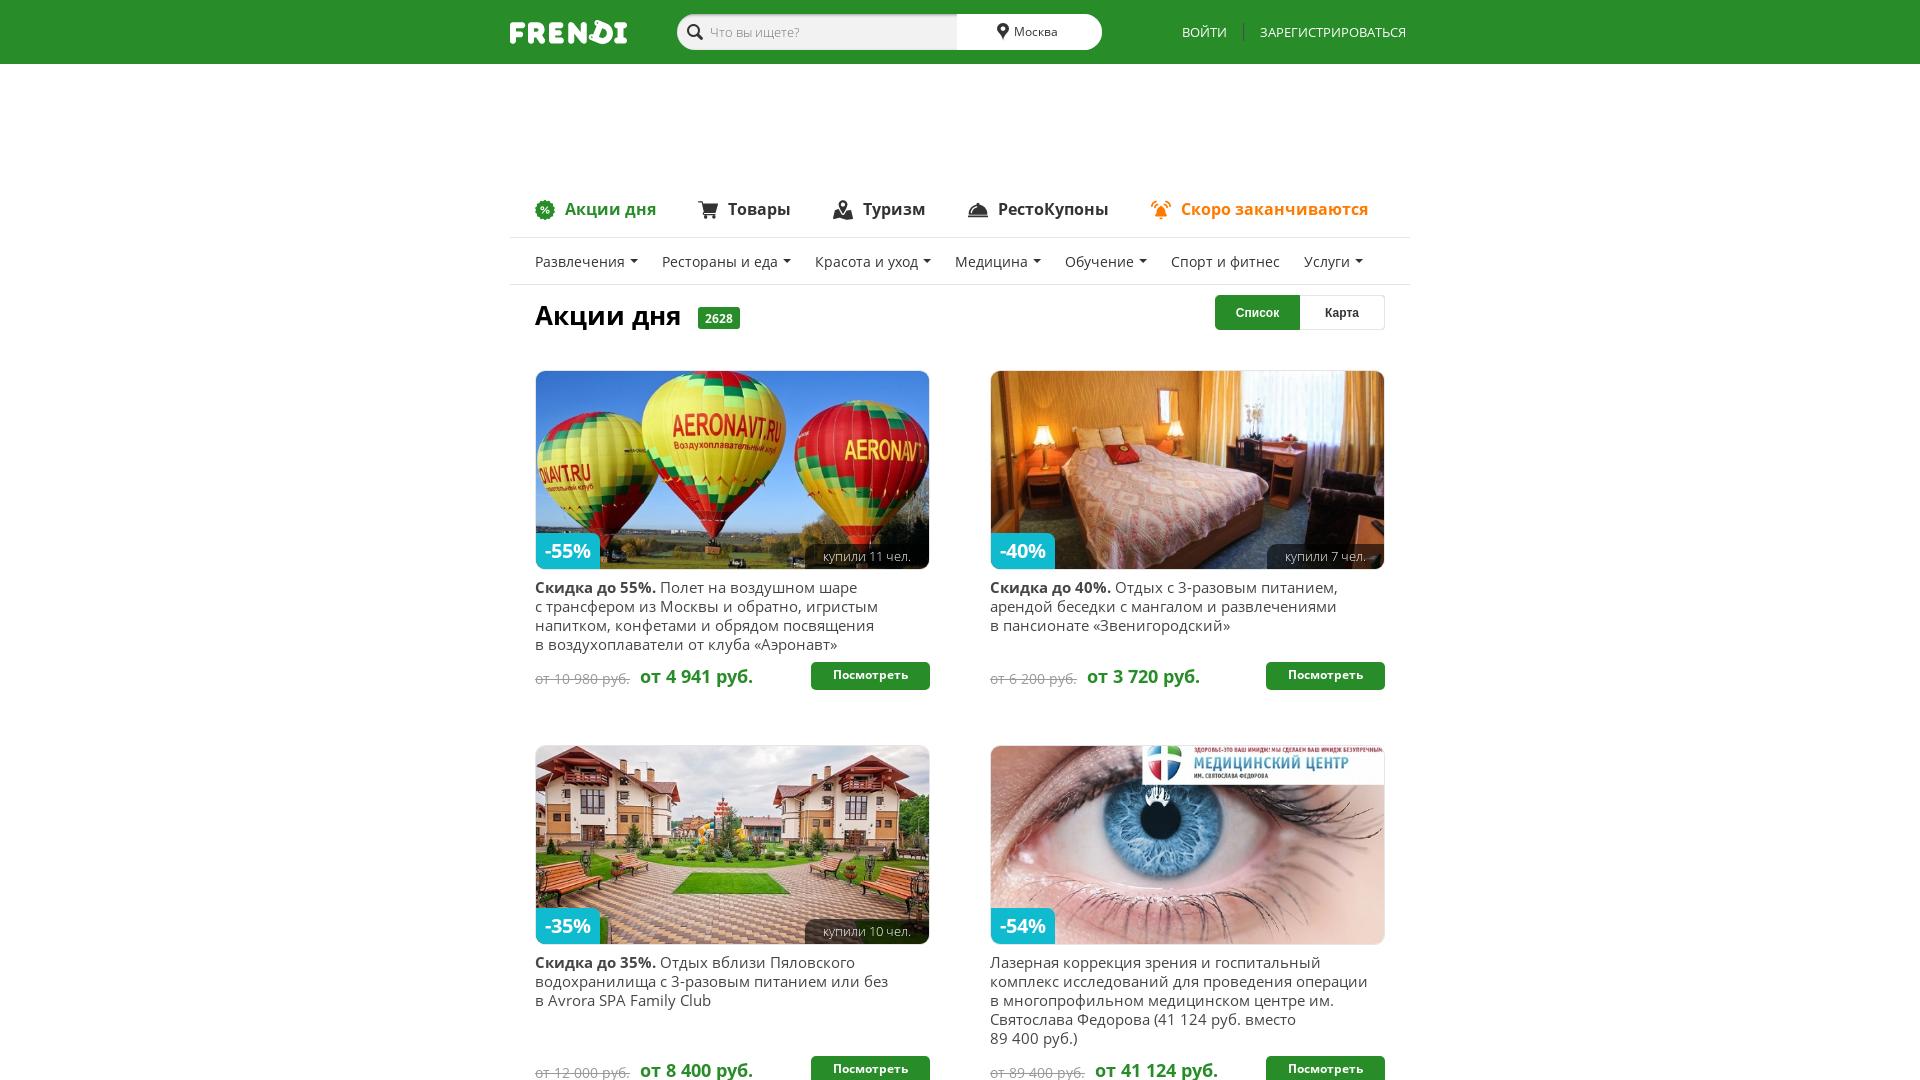 Frendi website